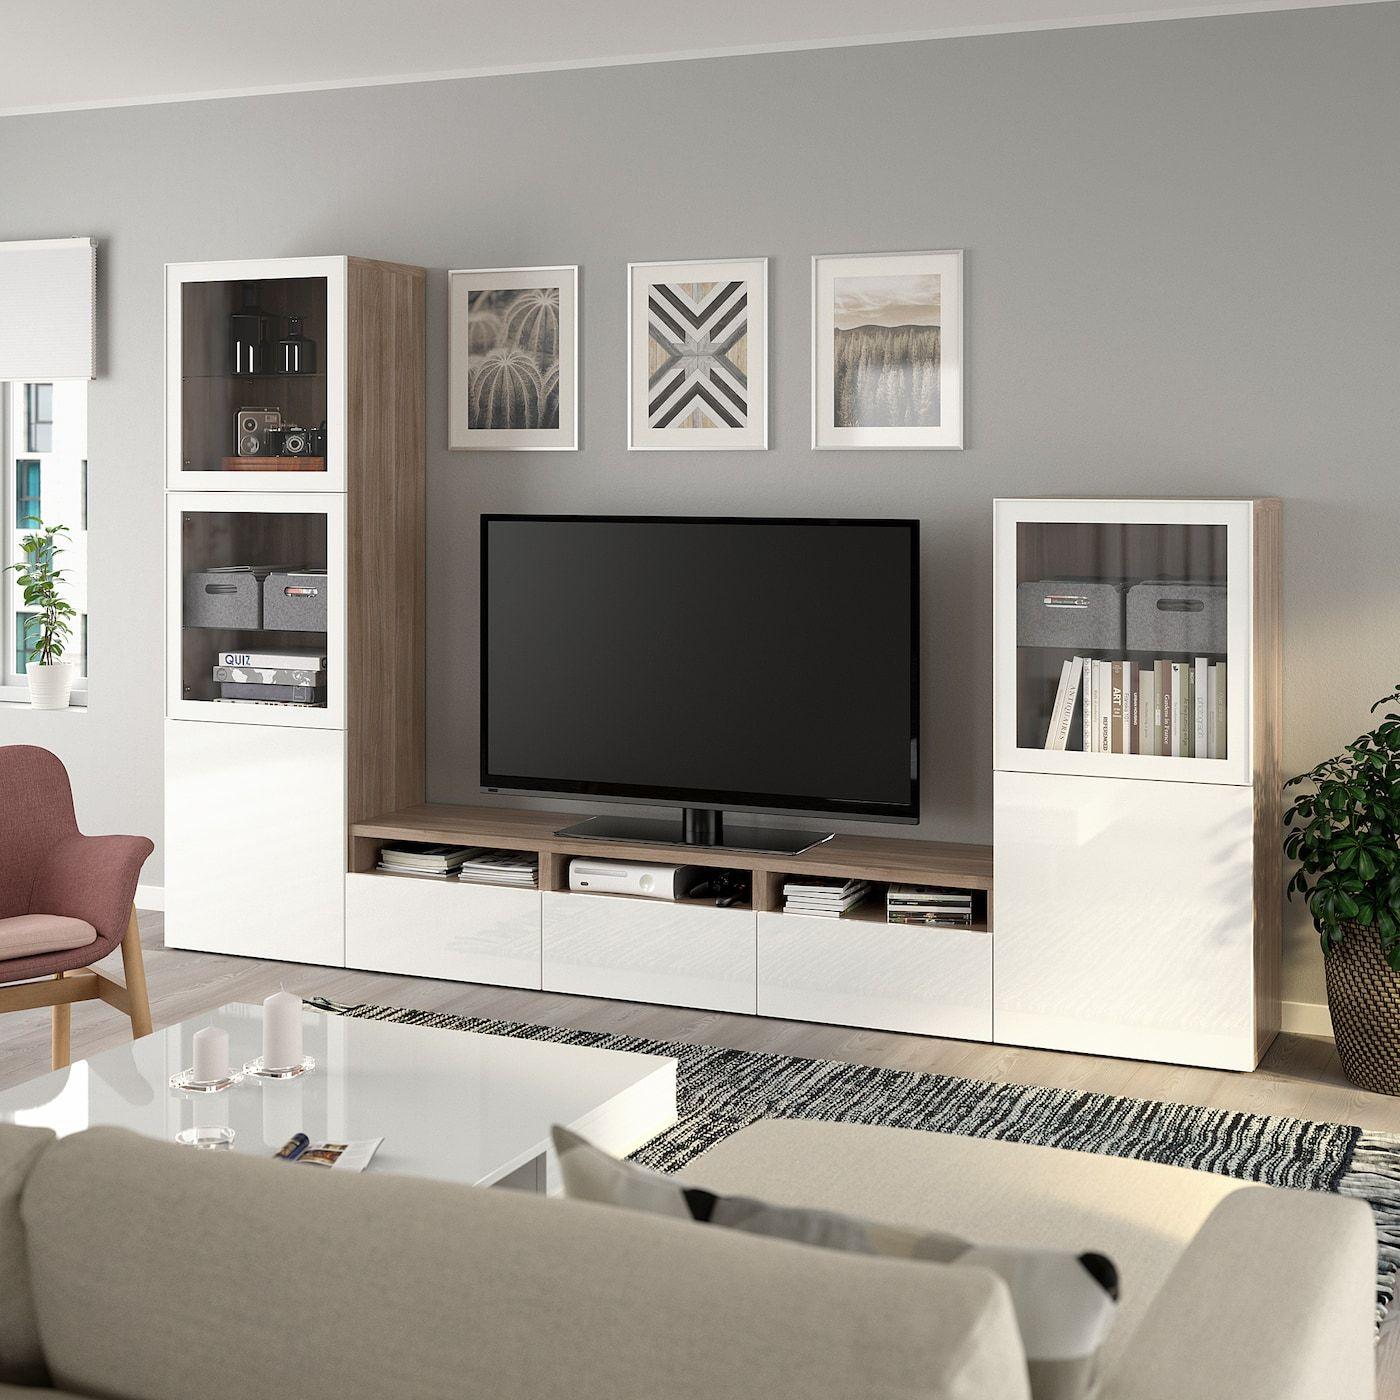 Ikea Besta Tv Storage Combination Glass Doors Walnut Effect Light Deco Meuble Tele Meuble Living Idee Meuble Tv